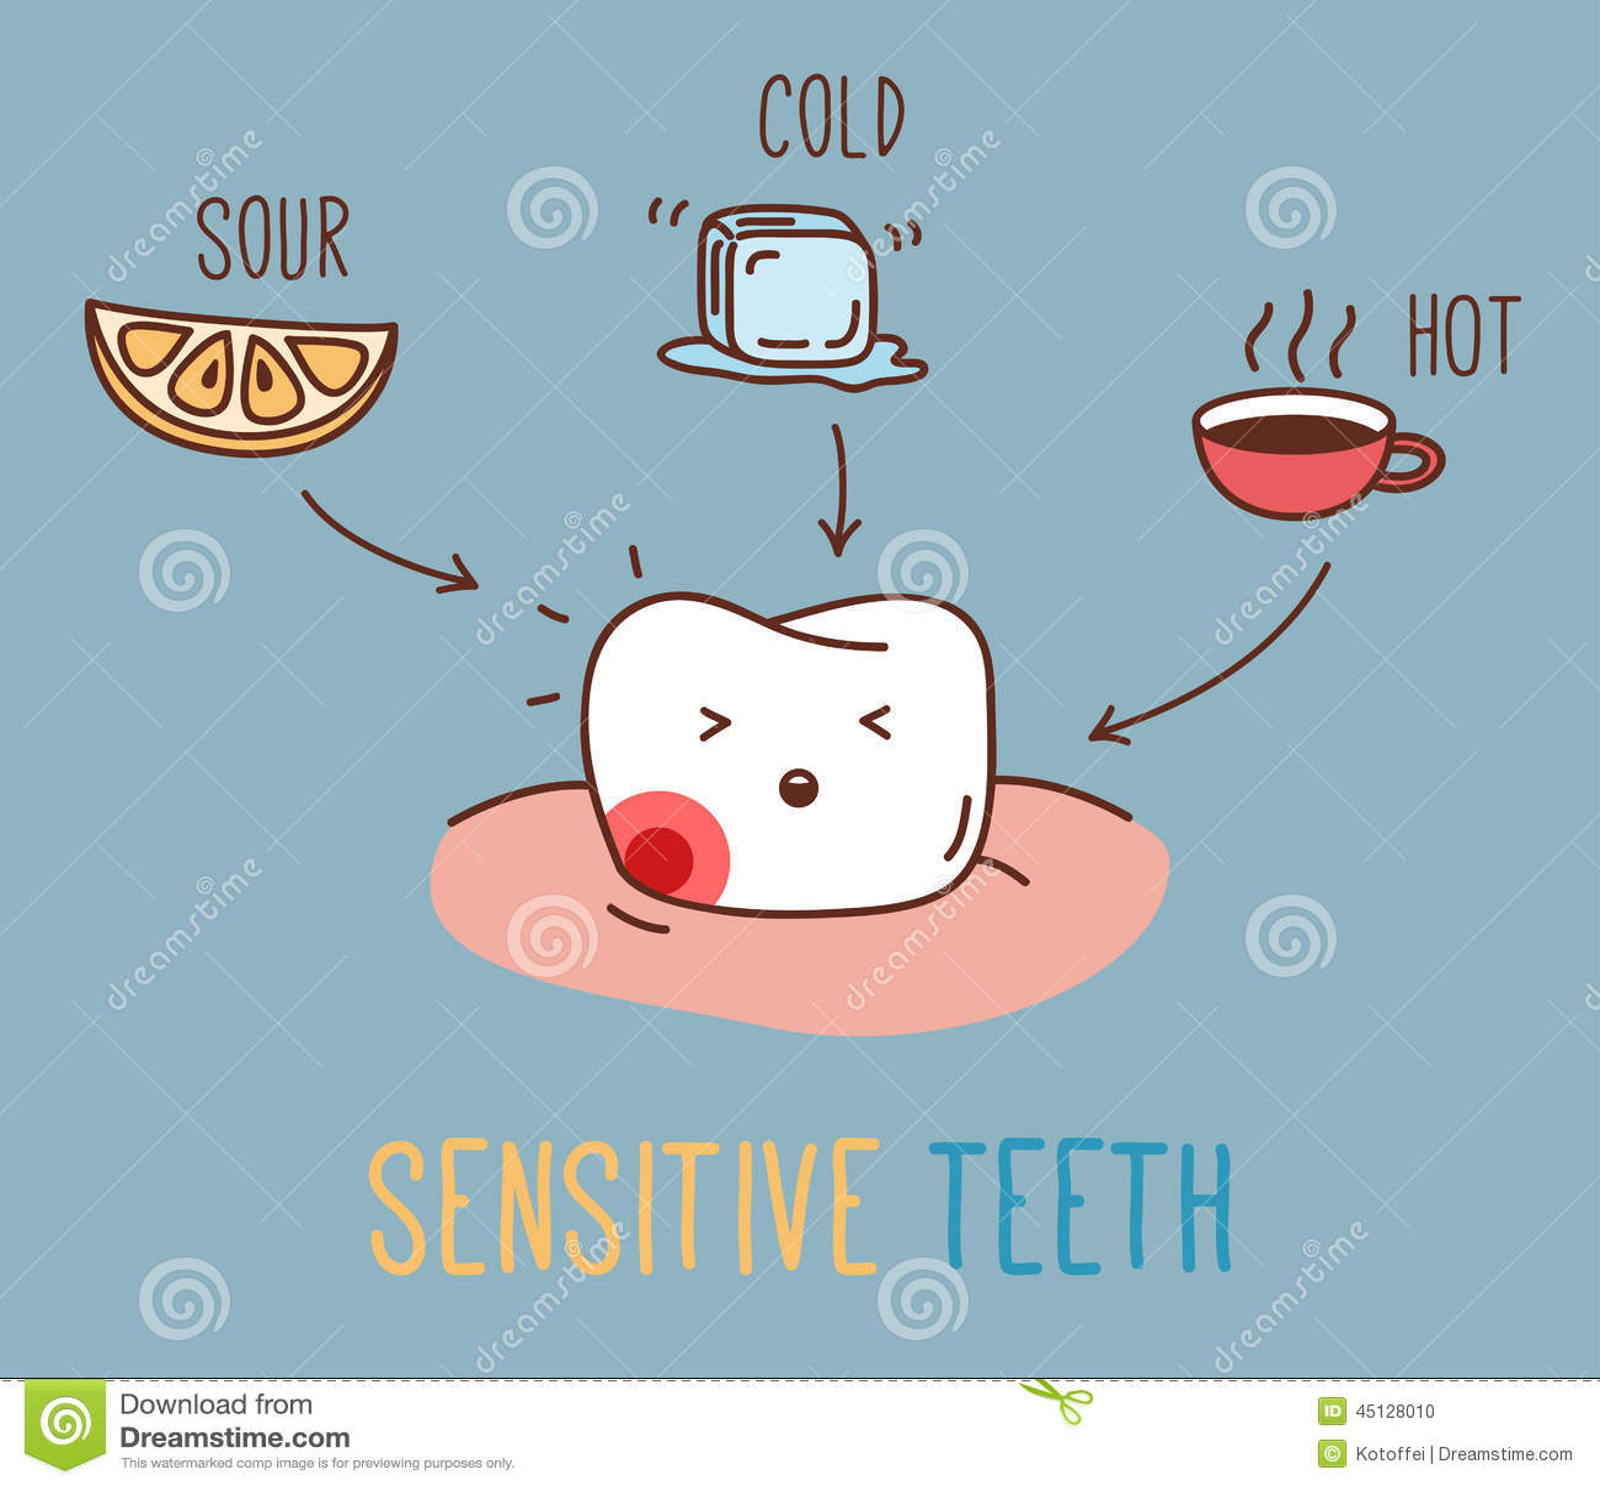 Sensitive teeth!!!!!!!?